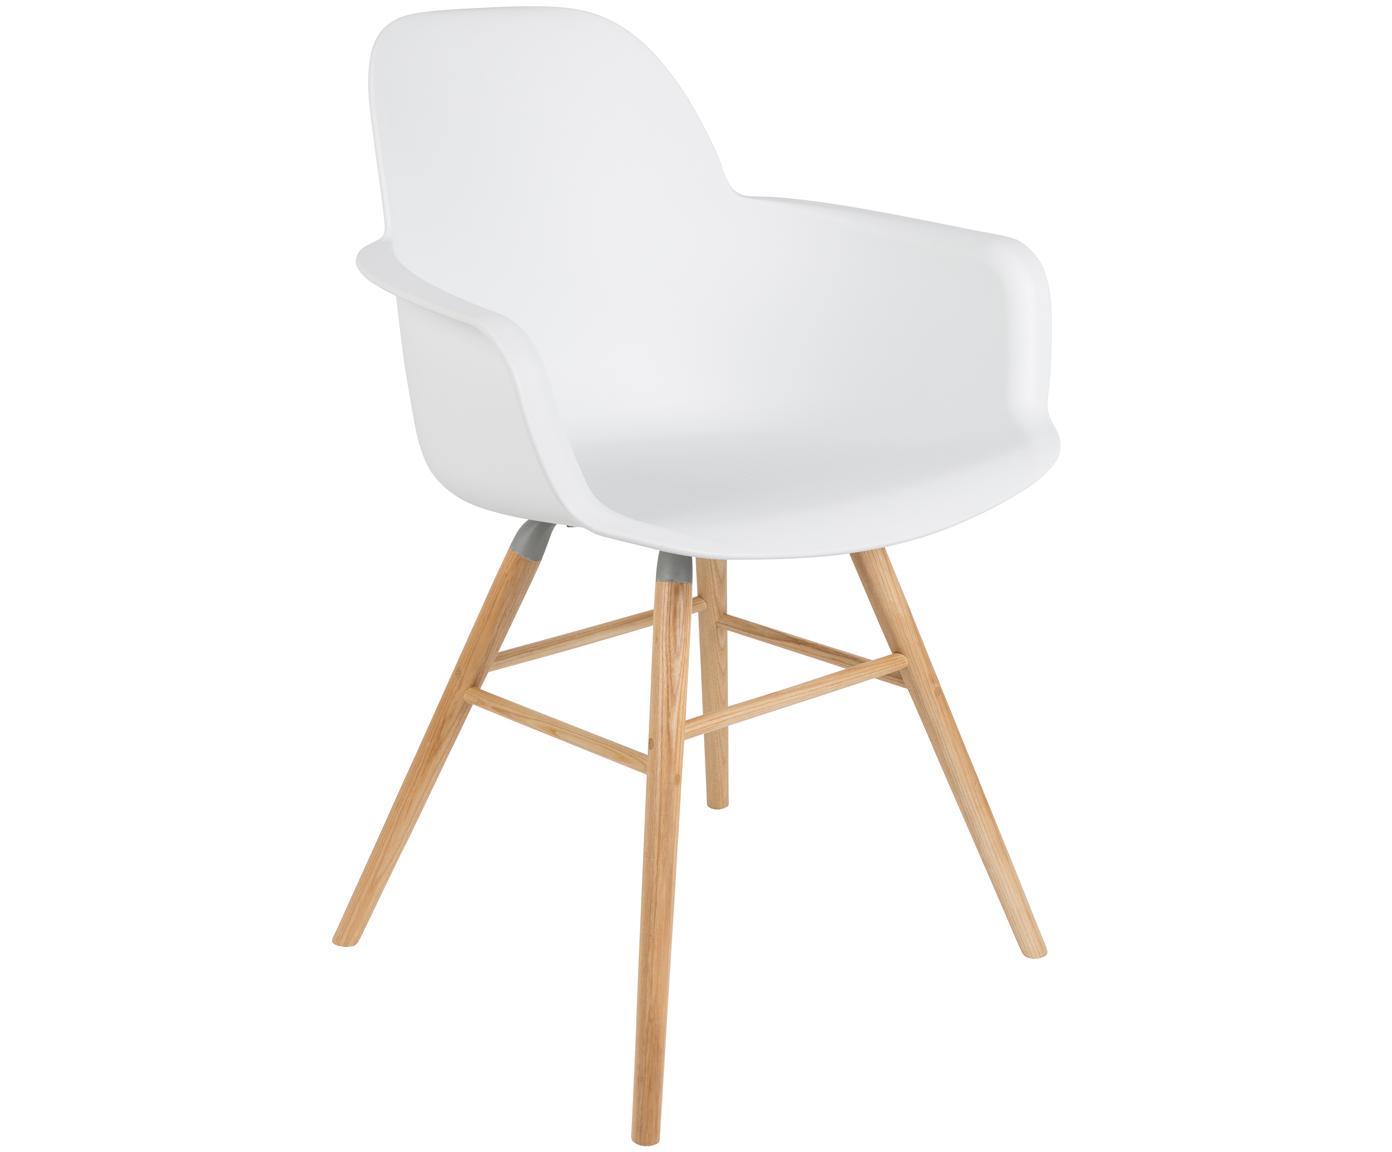 Armlehnstuhl Albert Kuip mit Holzbeinen, Sitzfläche: 100% Polypropylen, Füße: Eschenholz, Weiß, B 59 x T 55 cm